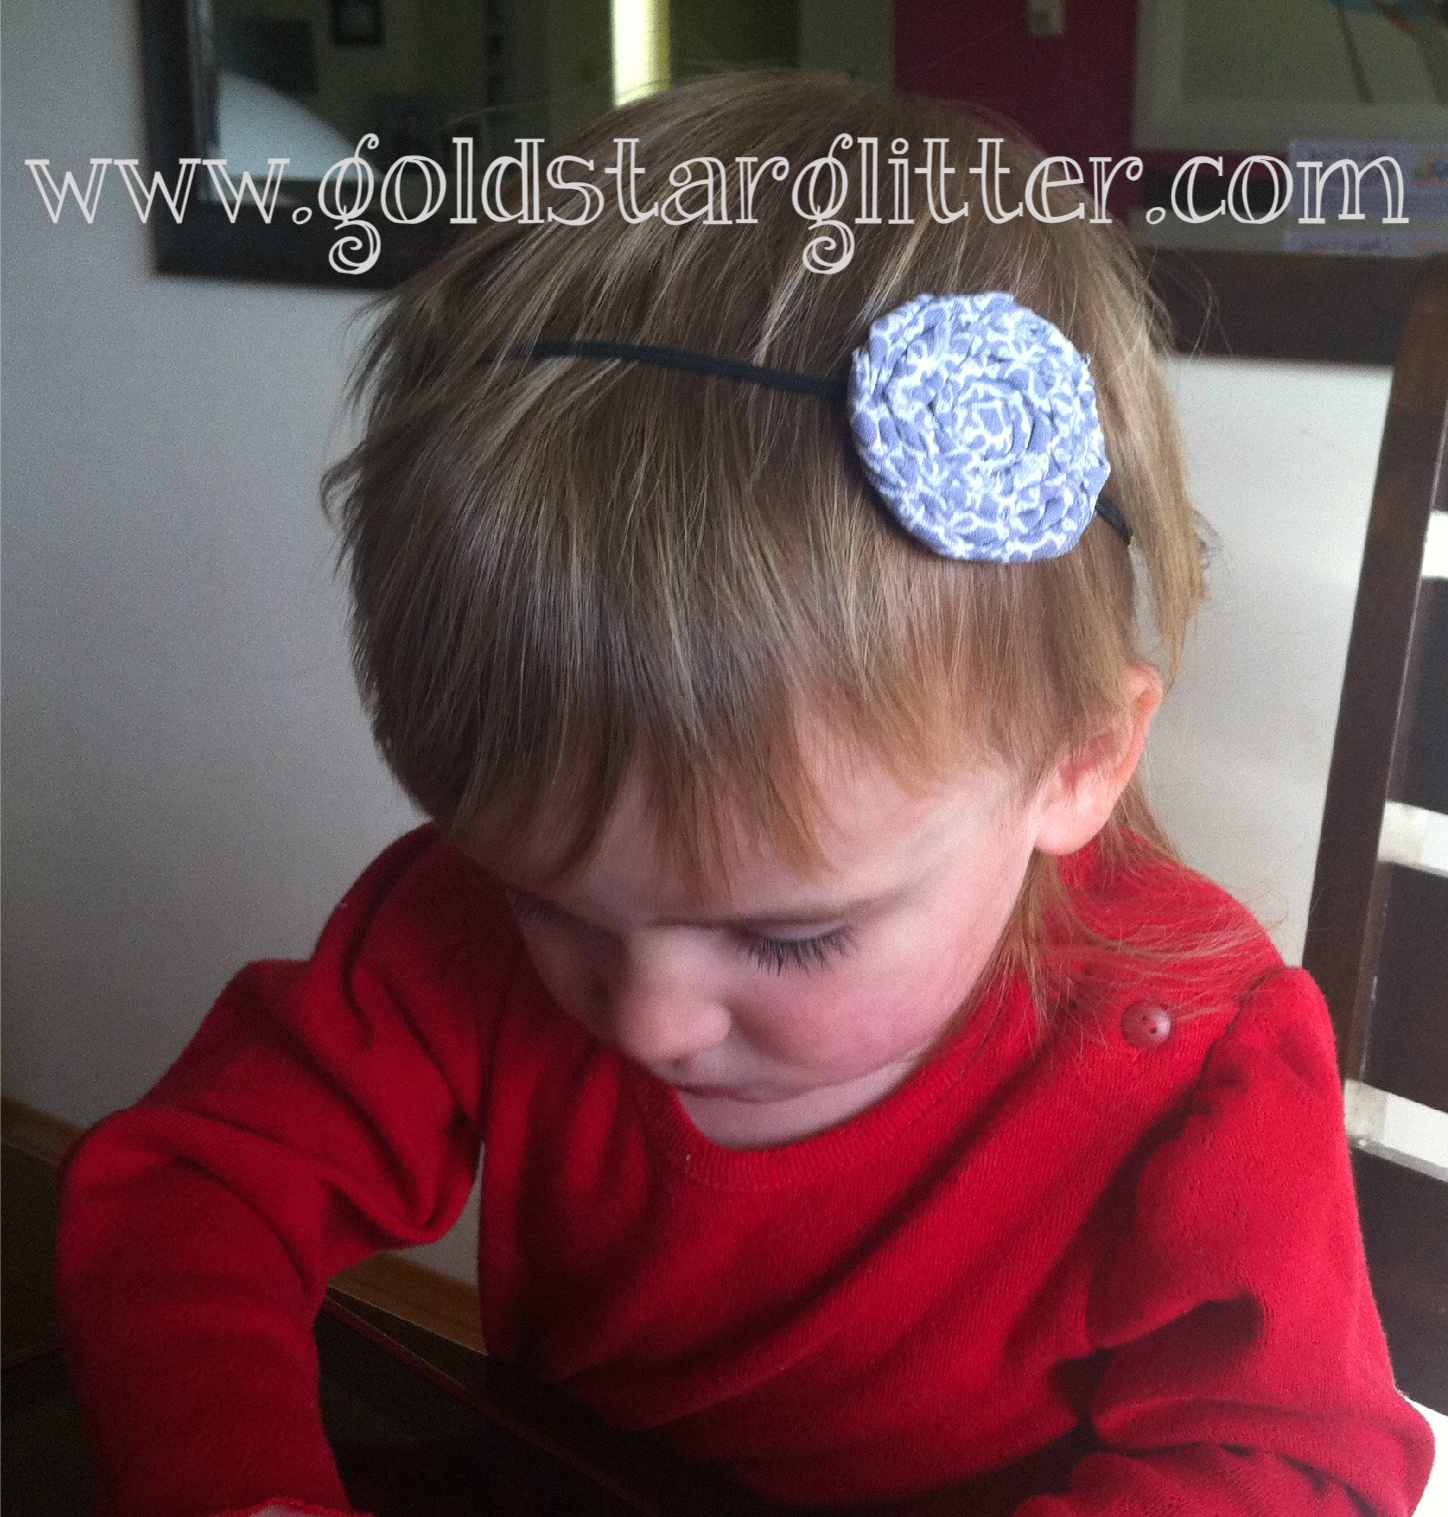 Handmade Rosette Headband